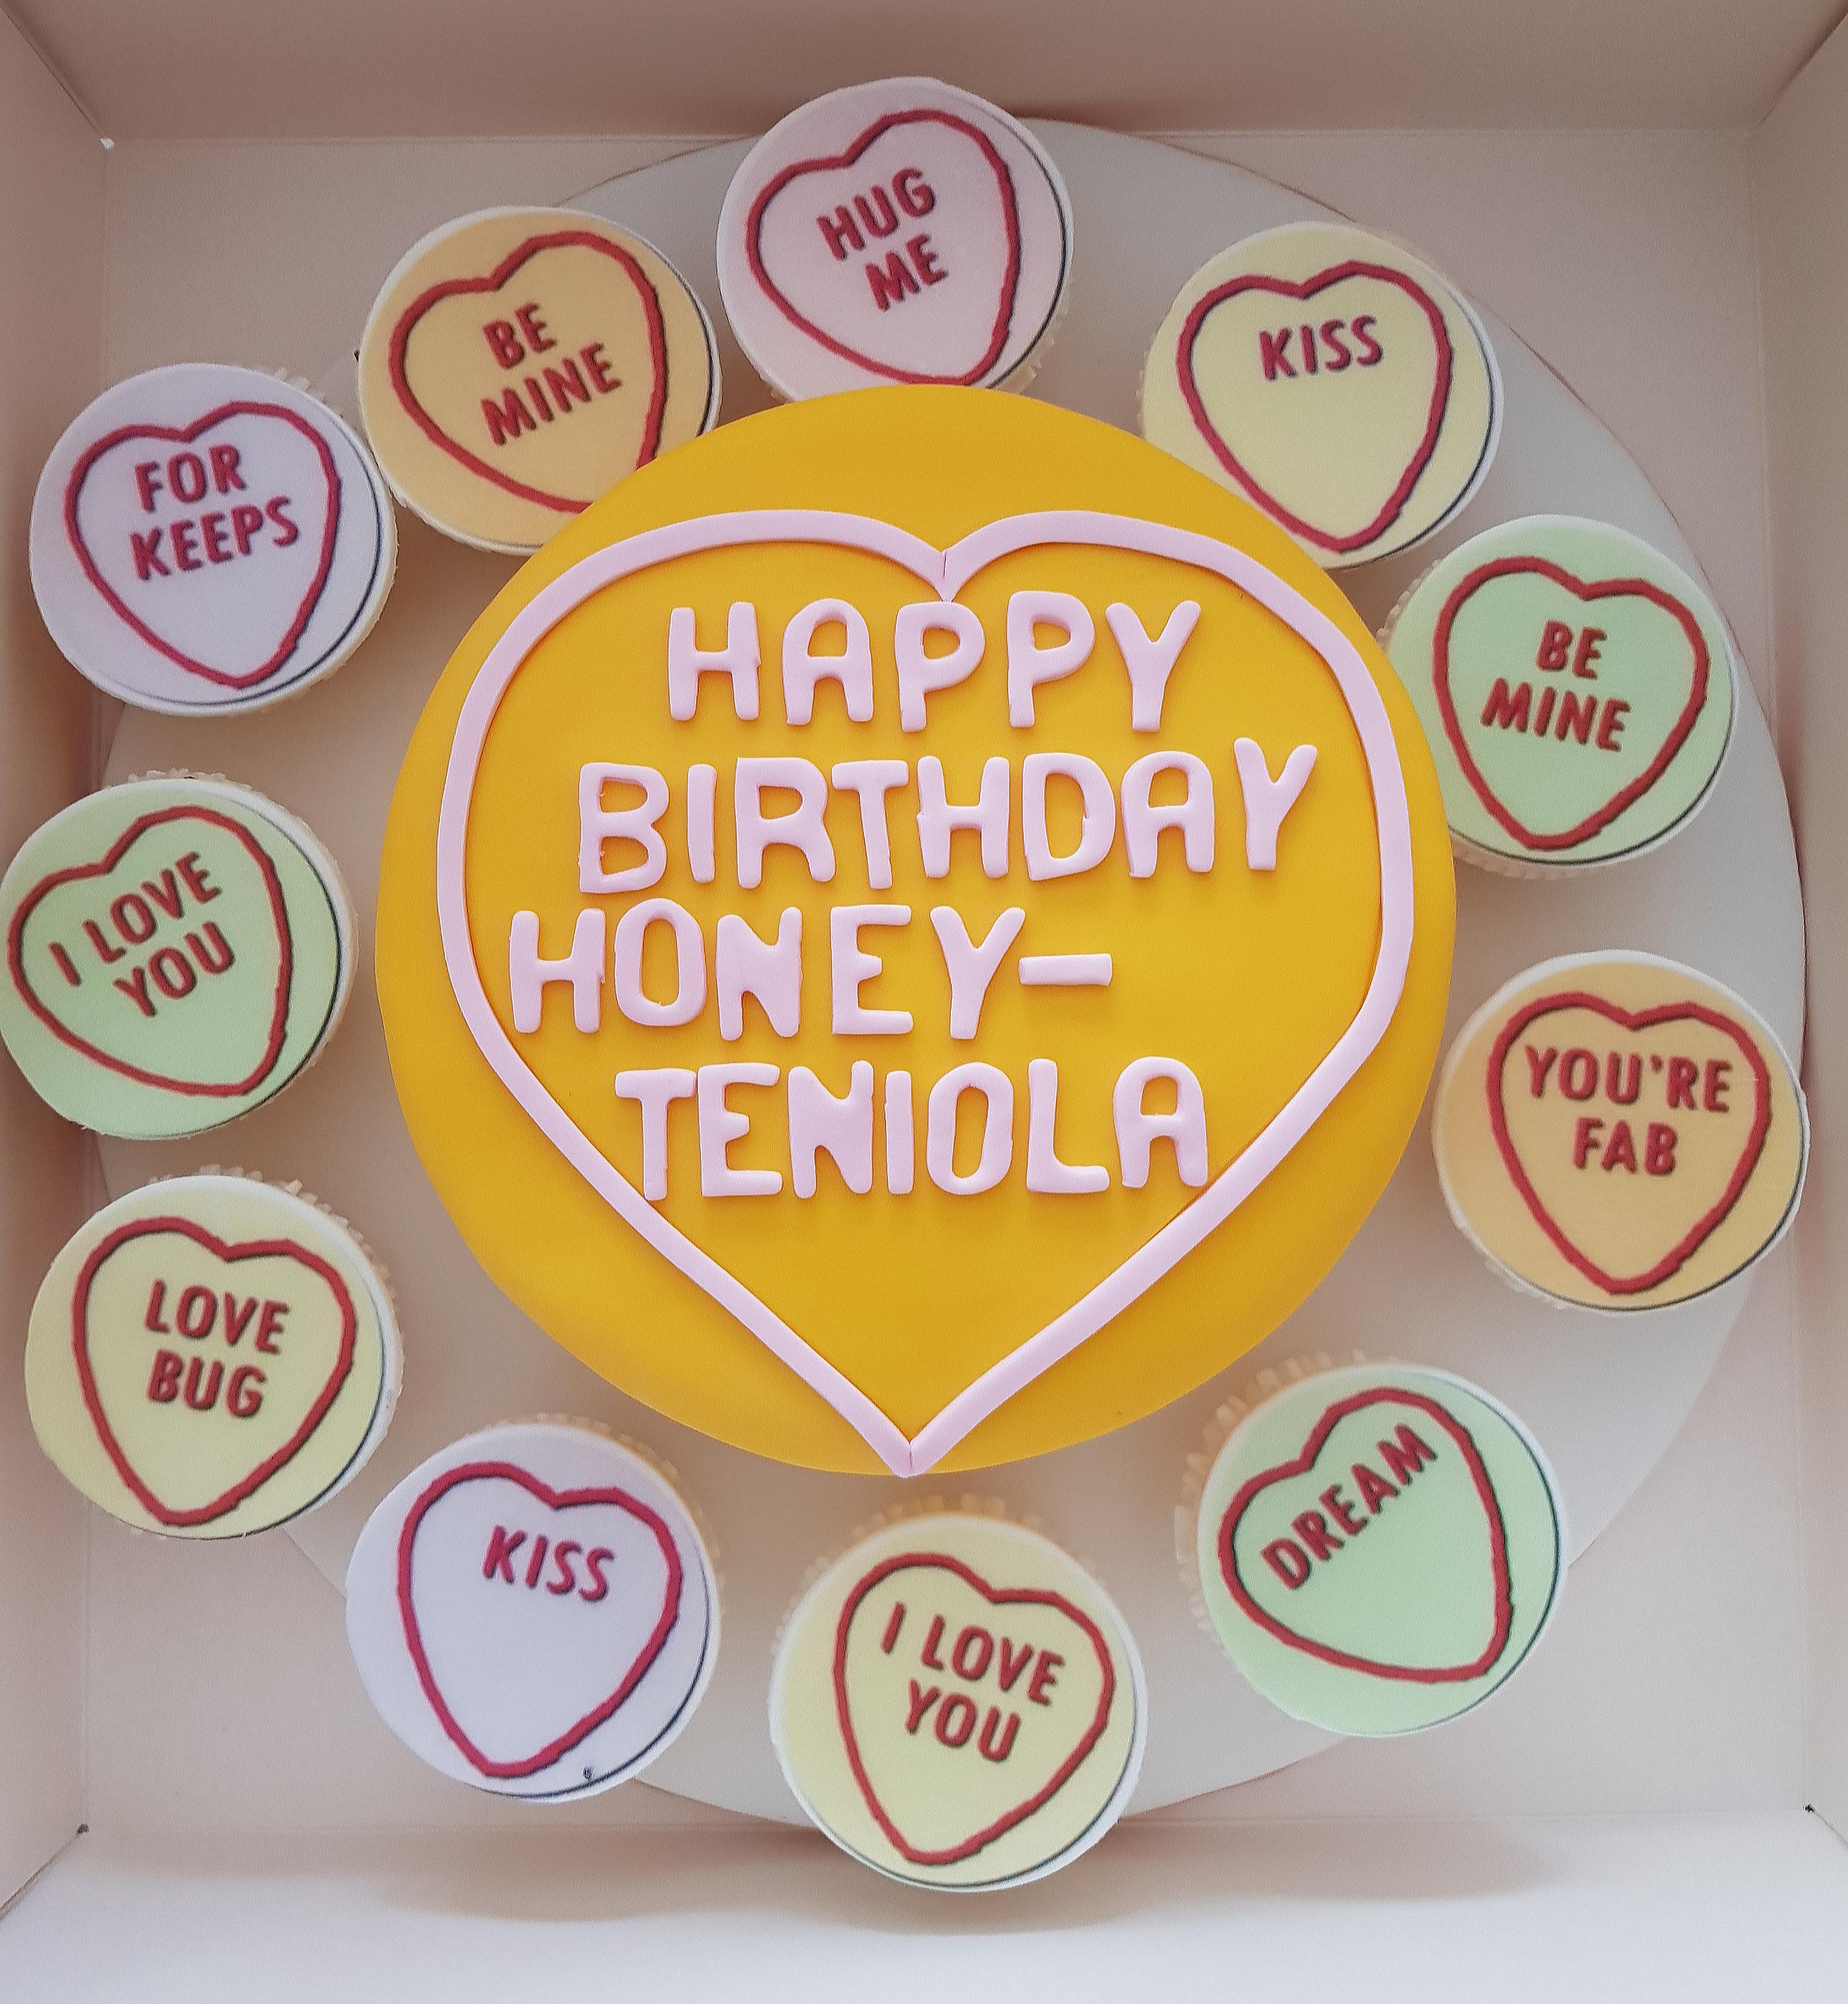 Outstanding Love All Around Cake Flowerandballooncompany Com Funny Birthday Cards Online Barepcheapnameinfo